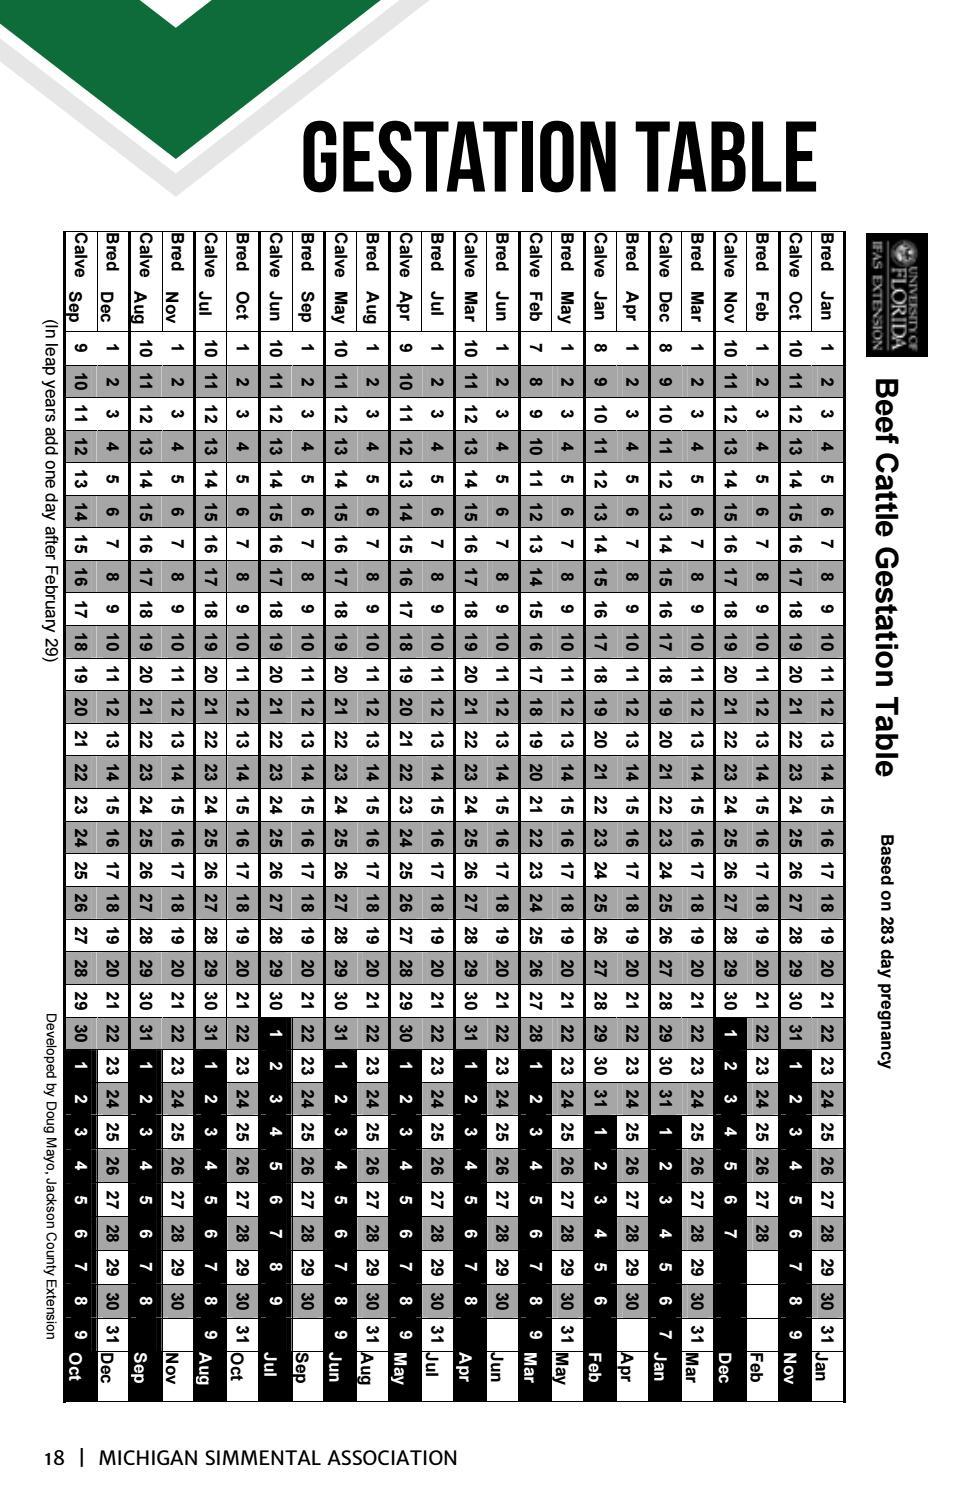 Michigan Simmental Association Breeders Directory 2017 2019